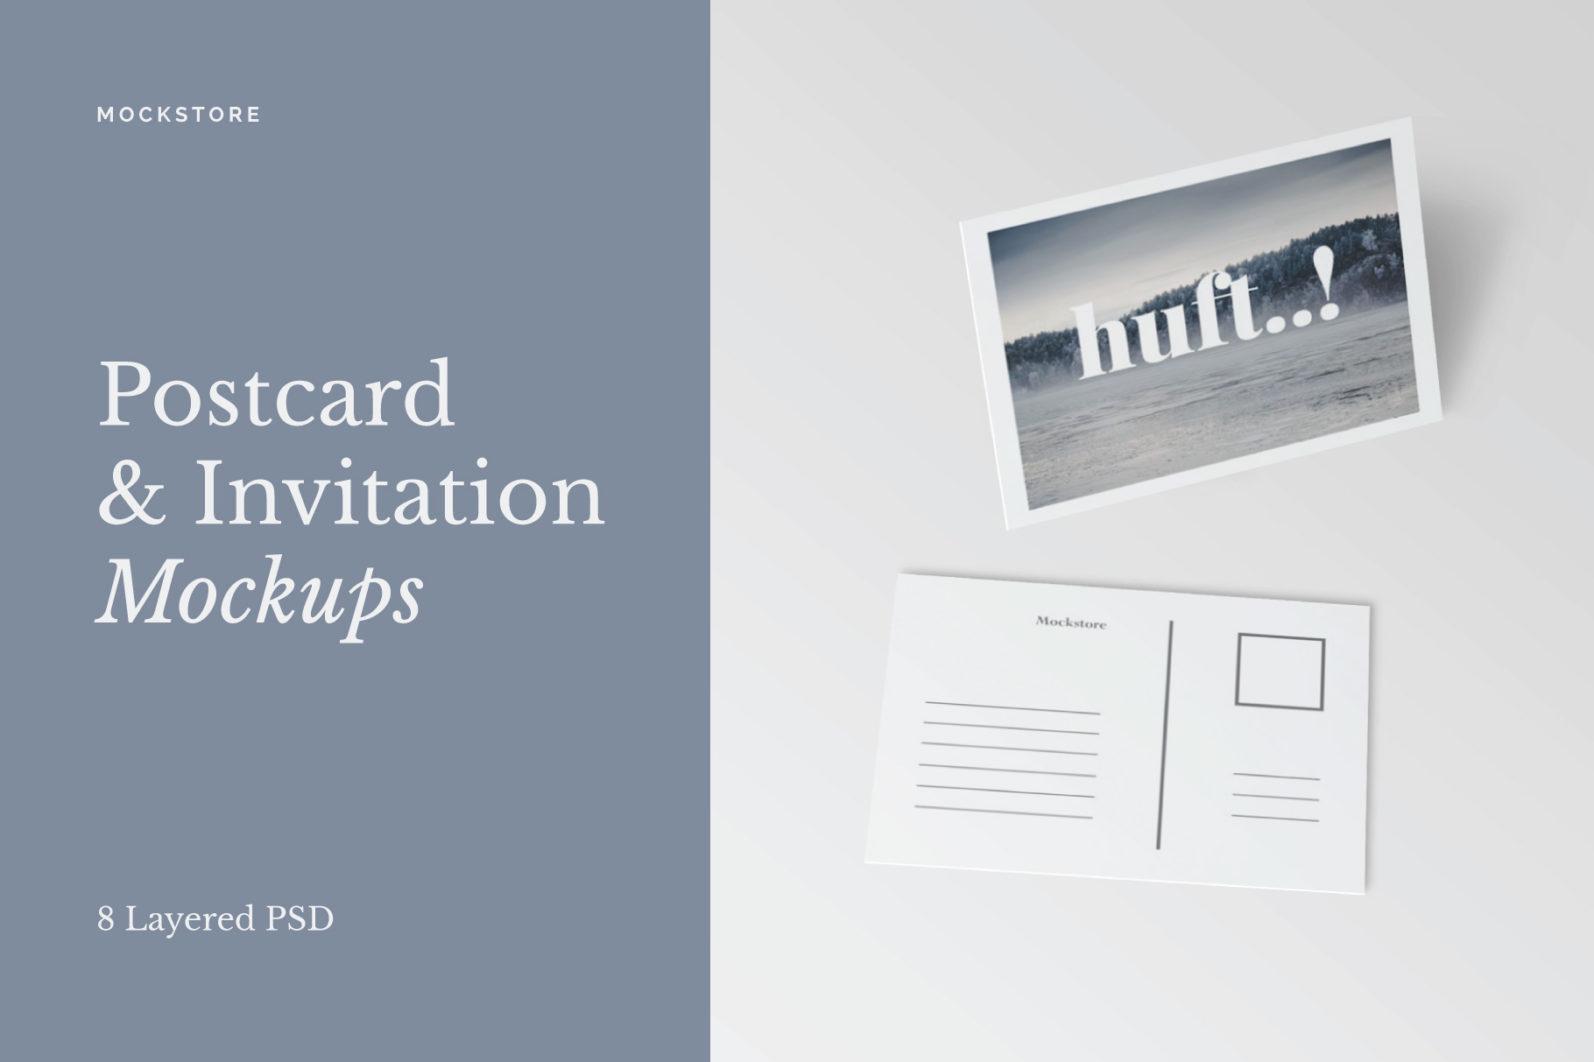 Postcard & Invitation Mockups - Postcard Invitation Mockups cover -